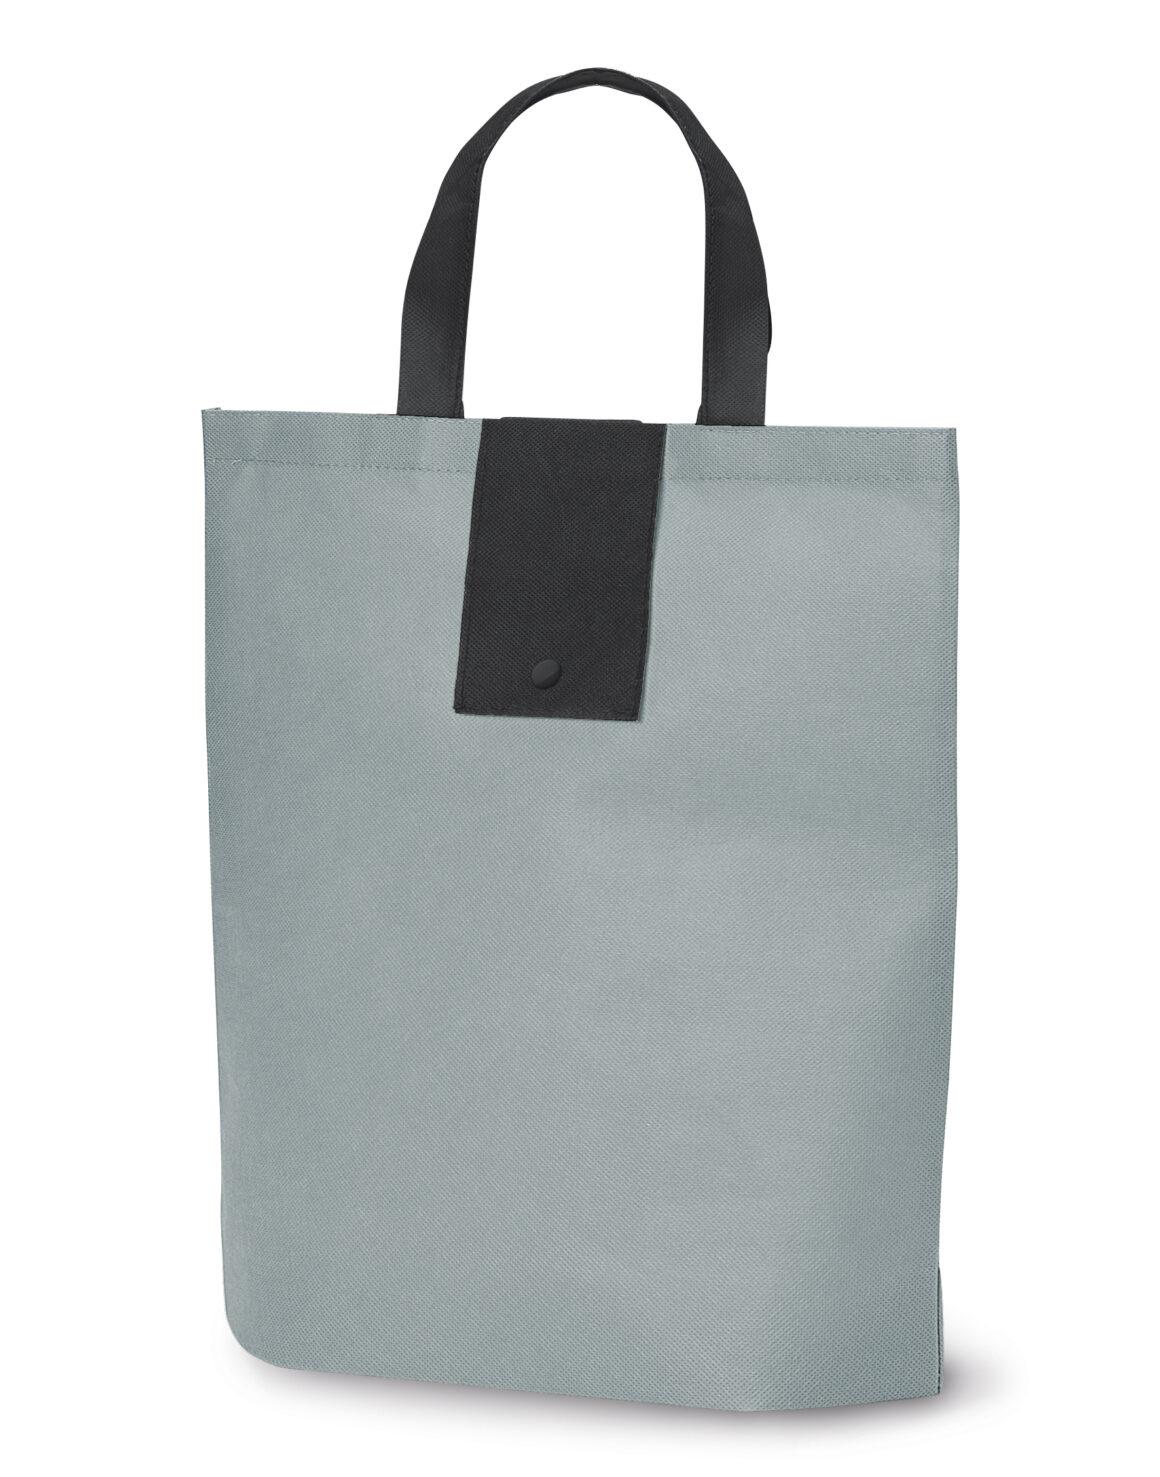 Pendrea Eco Foldable Bag Product Code GP92997